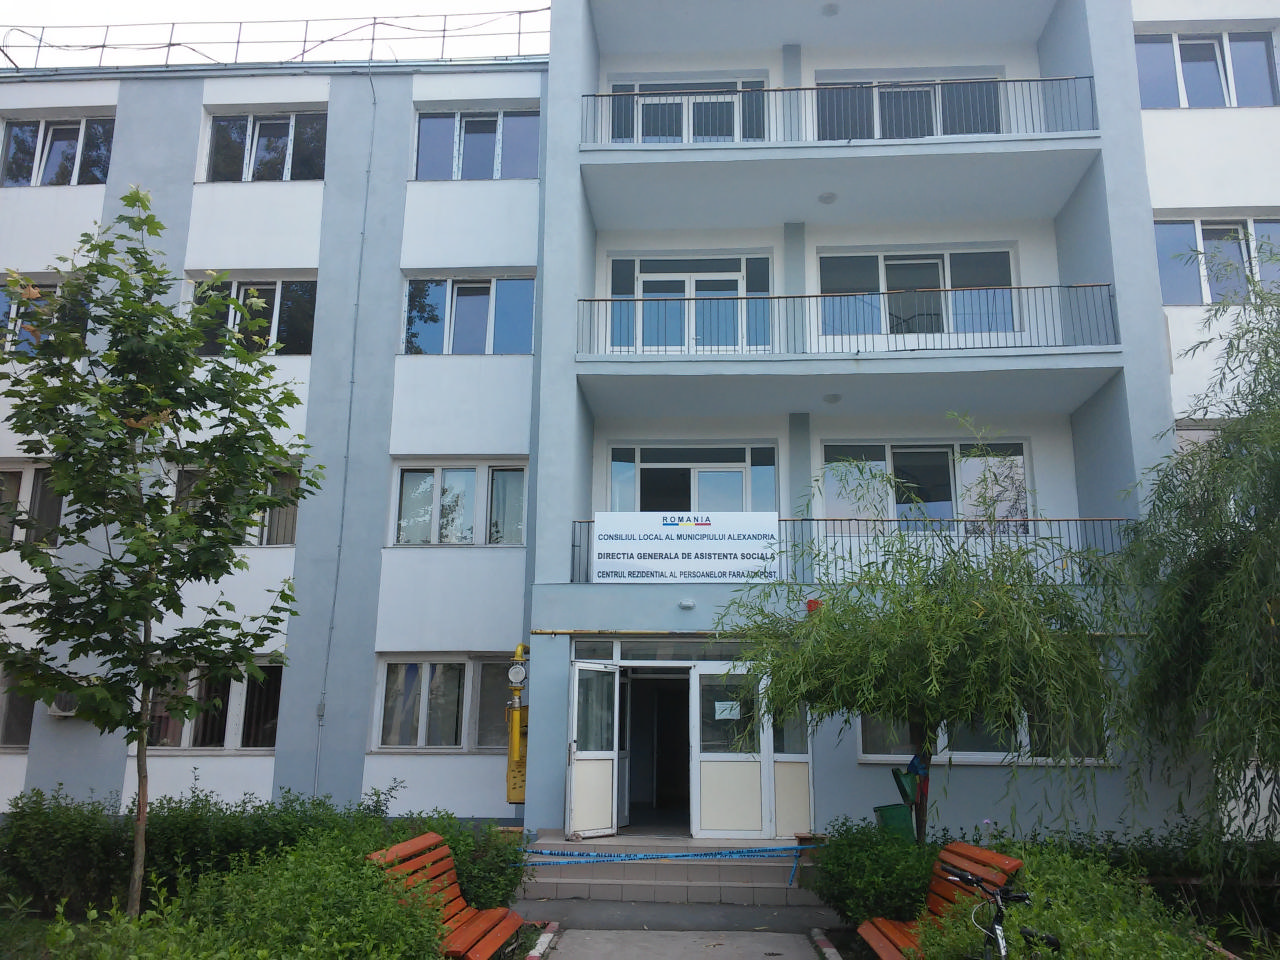 DGAS - Centrul rezidential al persoanelor fara adapost